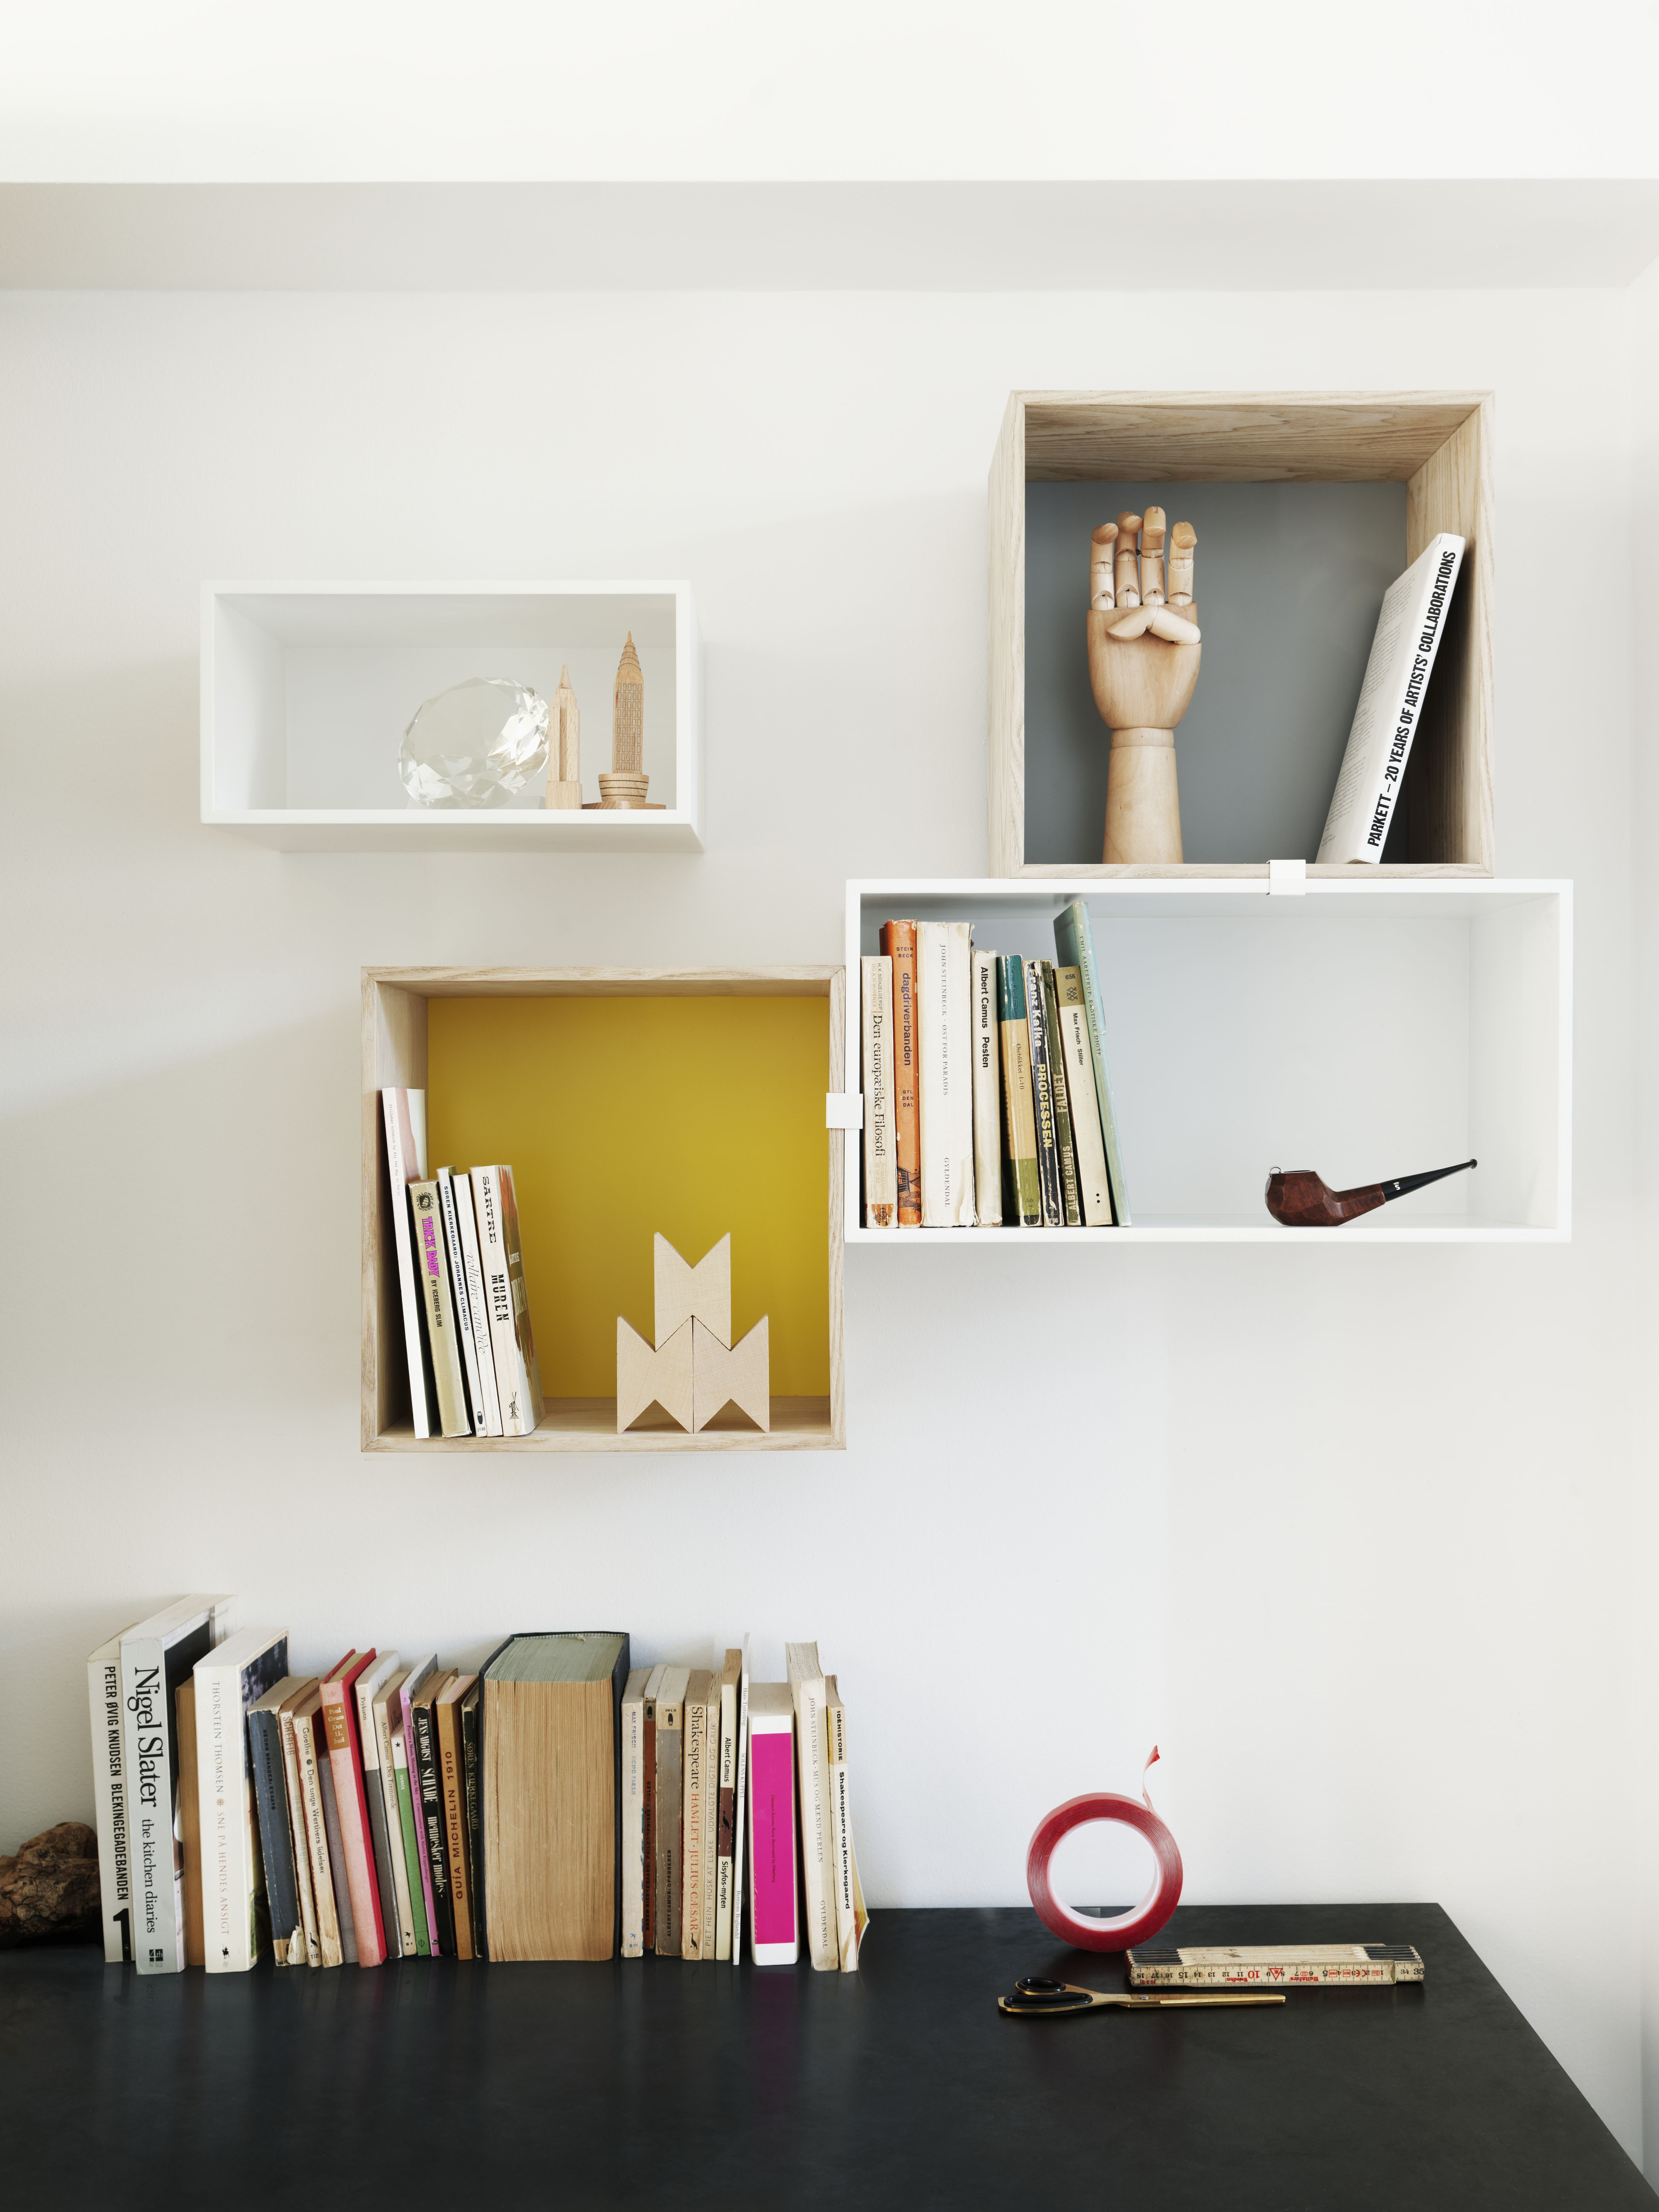 etag re mini stacked medium carr 33x33 cm avec fond color fr ne fond jaune muuto. Black Bedroom Furniture Sets. Home Design Ideas